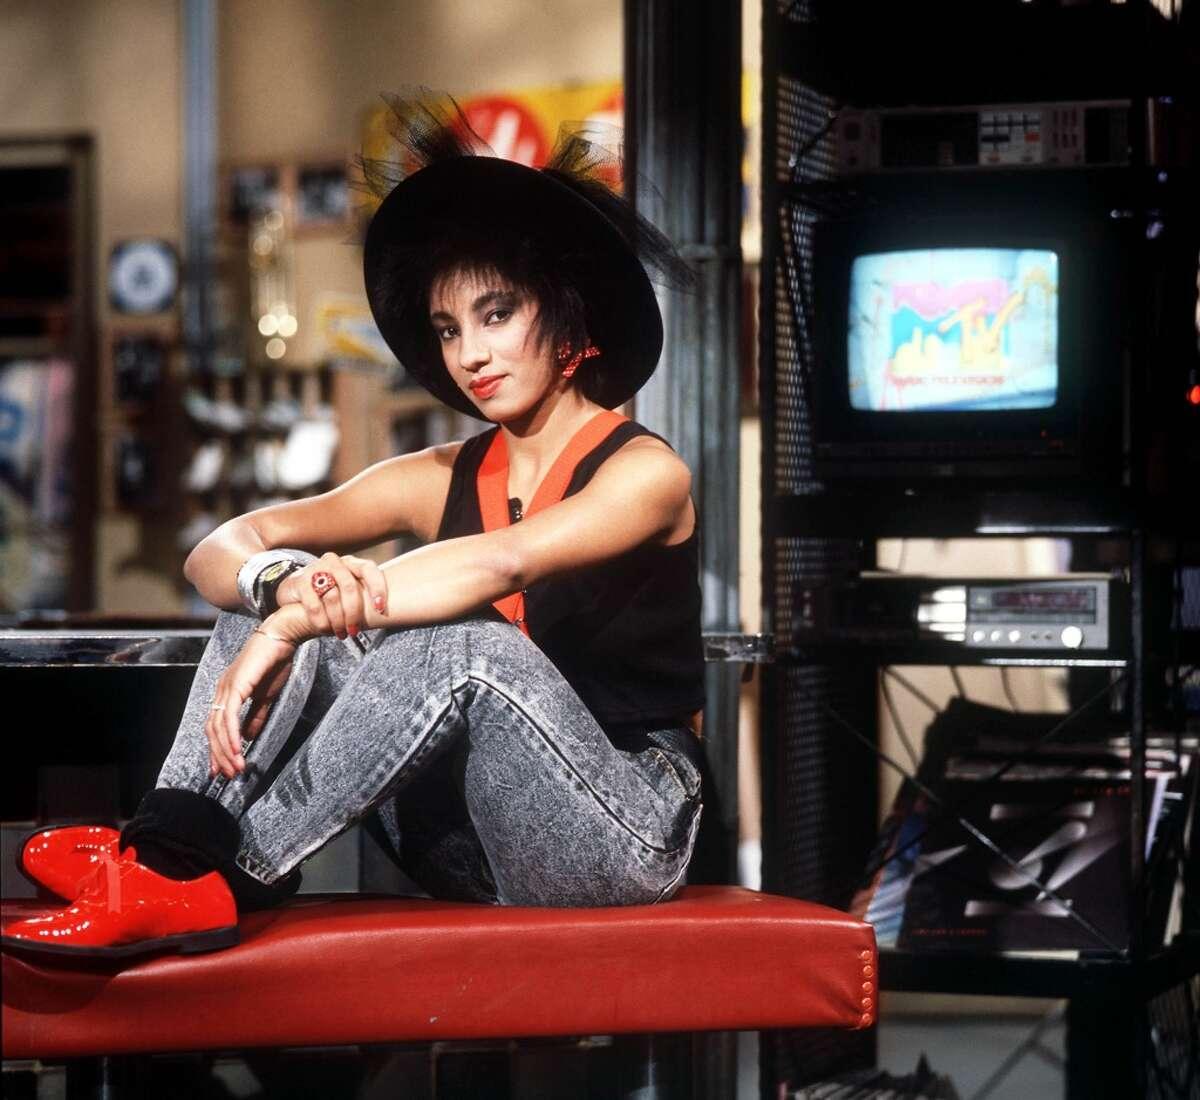 MTV VJ Downtown Julie Brown on the set in MTV's New York Studio in 1988. Photo by Frank Micelotta/ImageDirect.